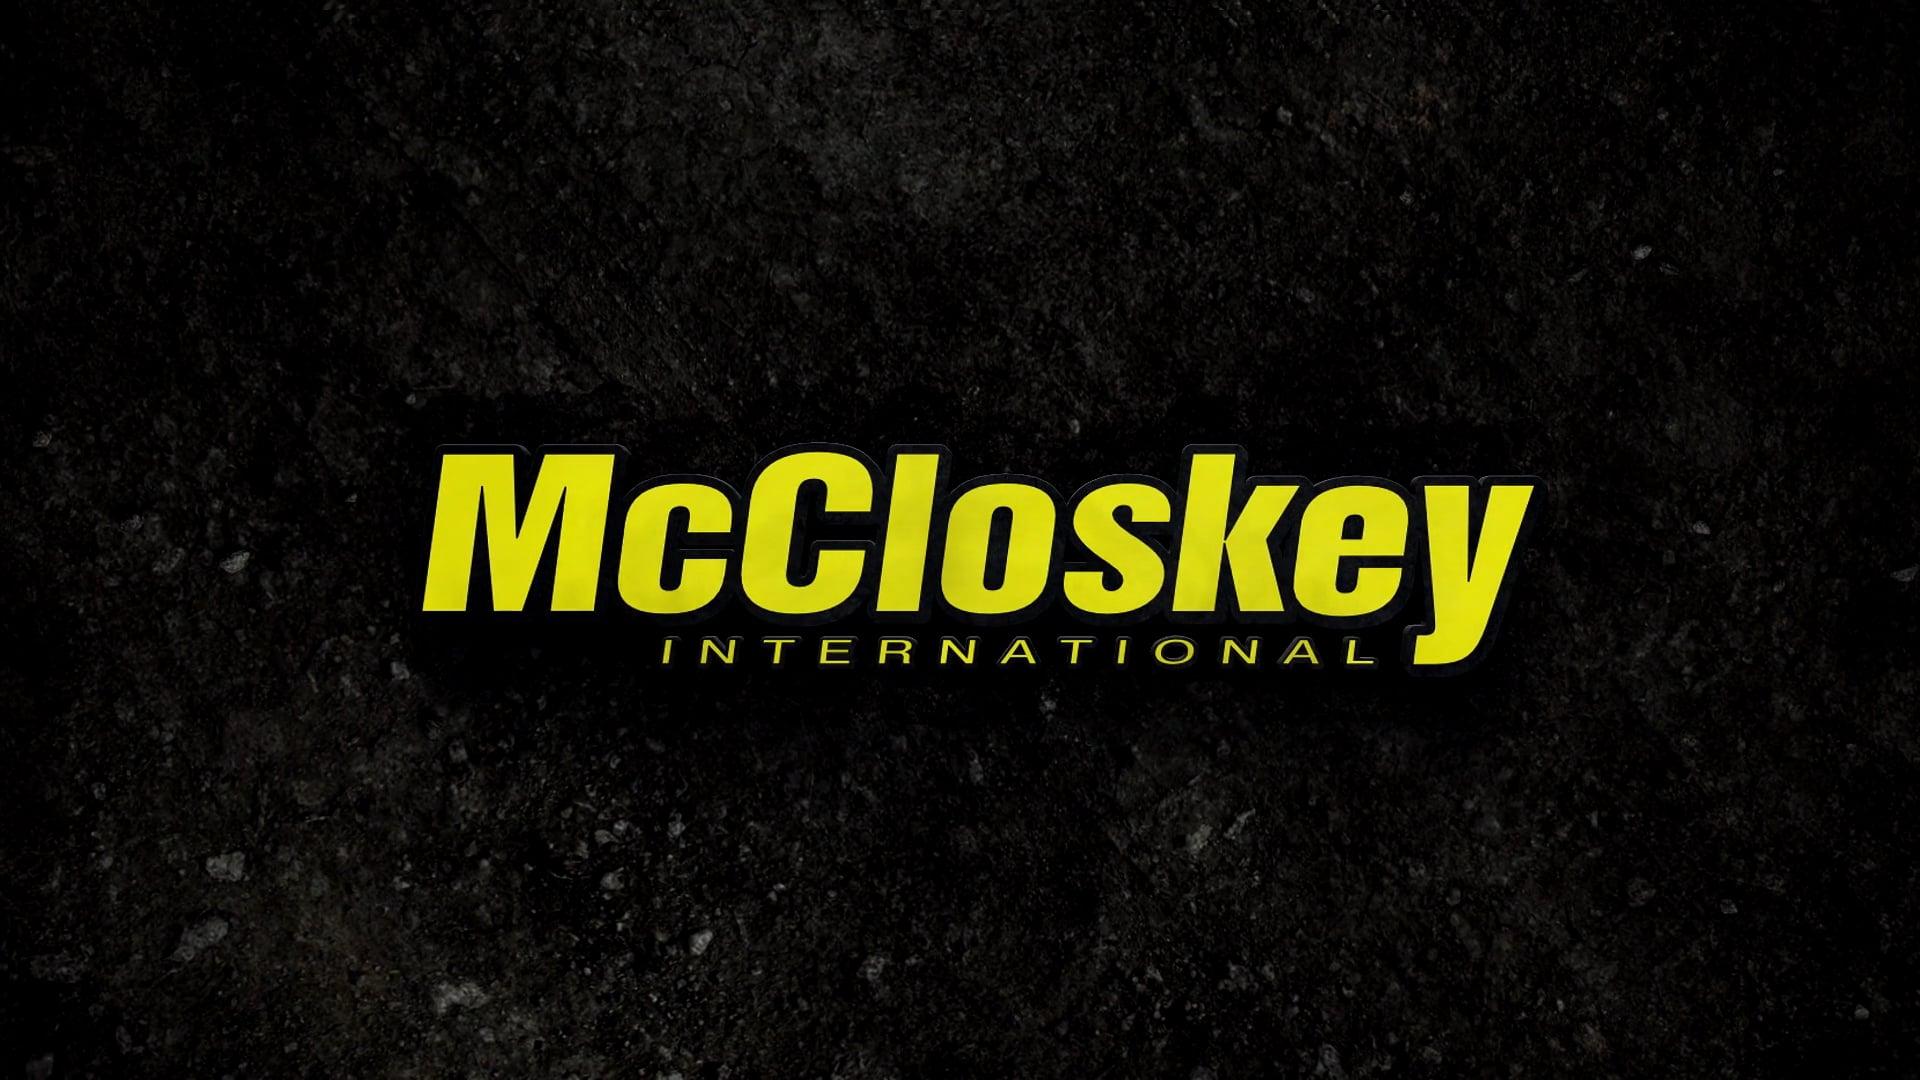 McCloskey International - 14C Trailer.